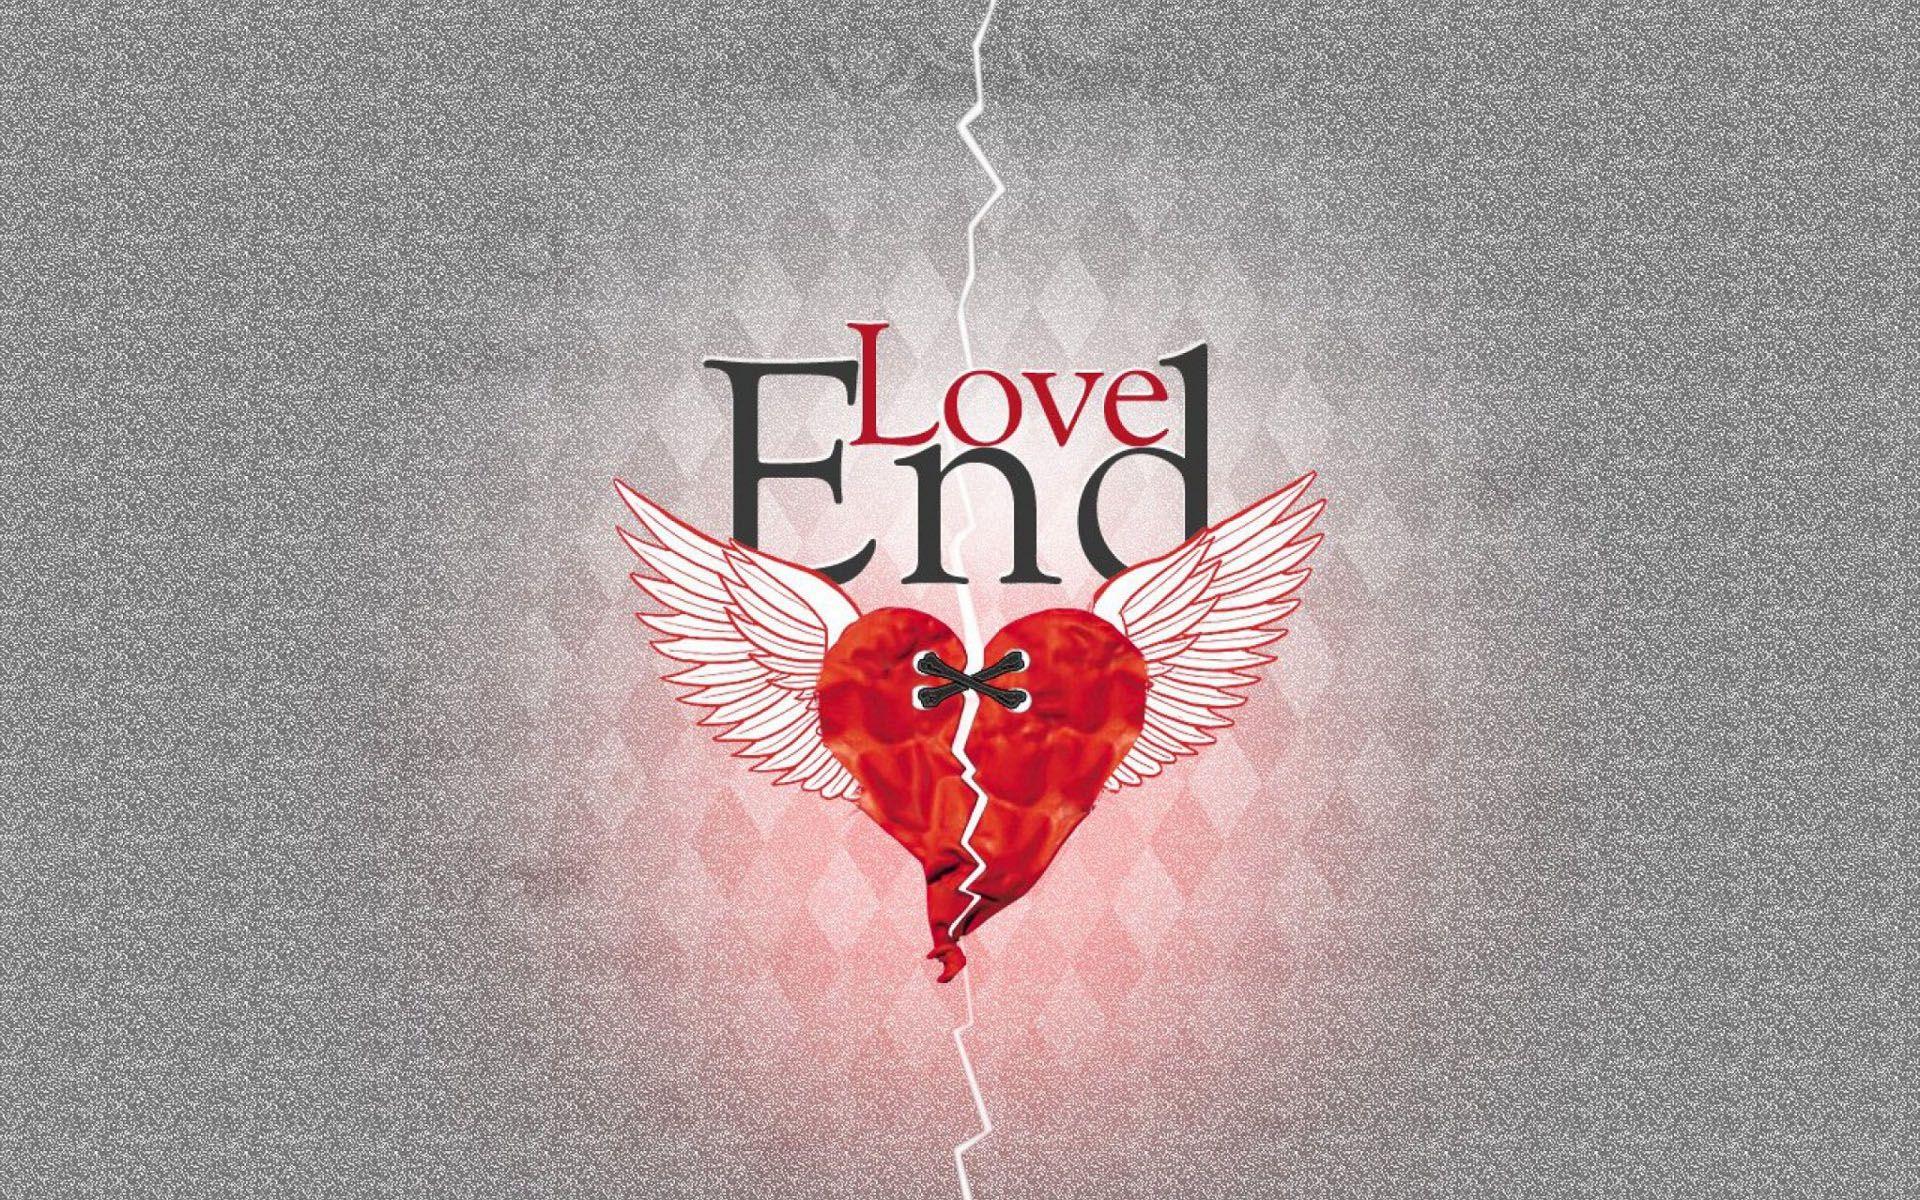 love breakup images download